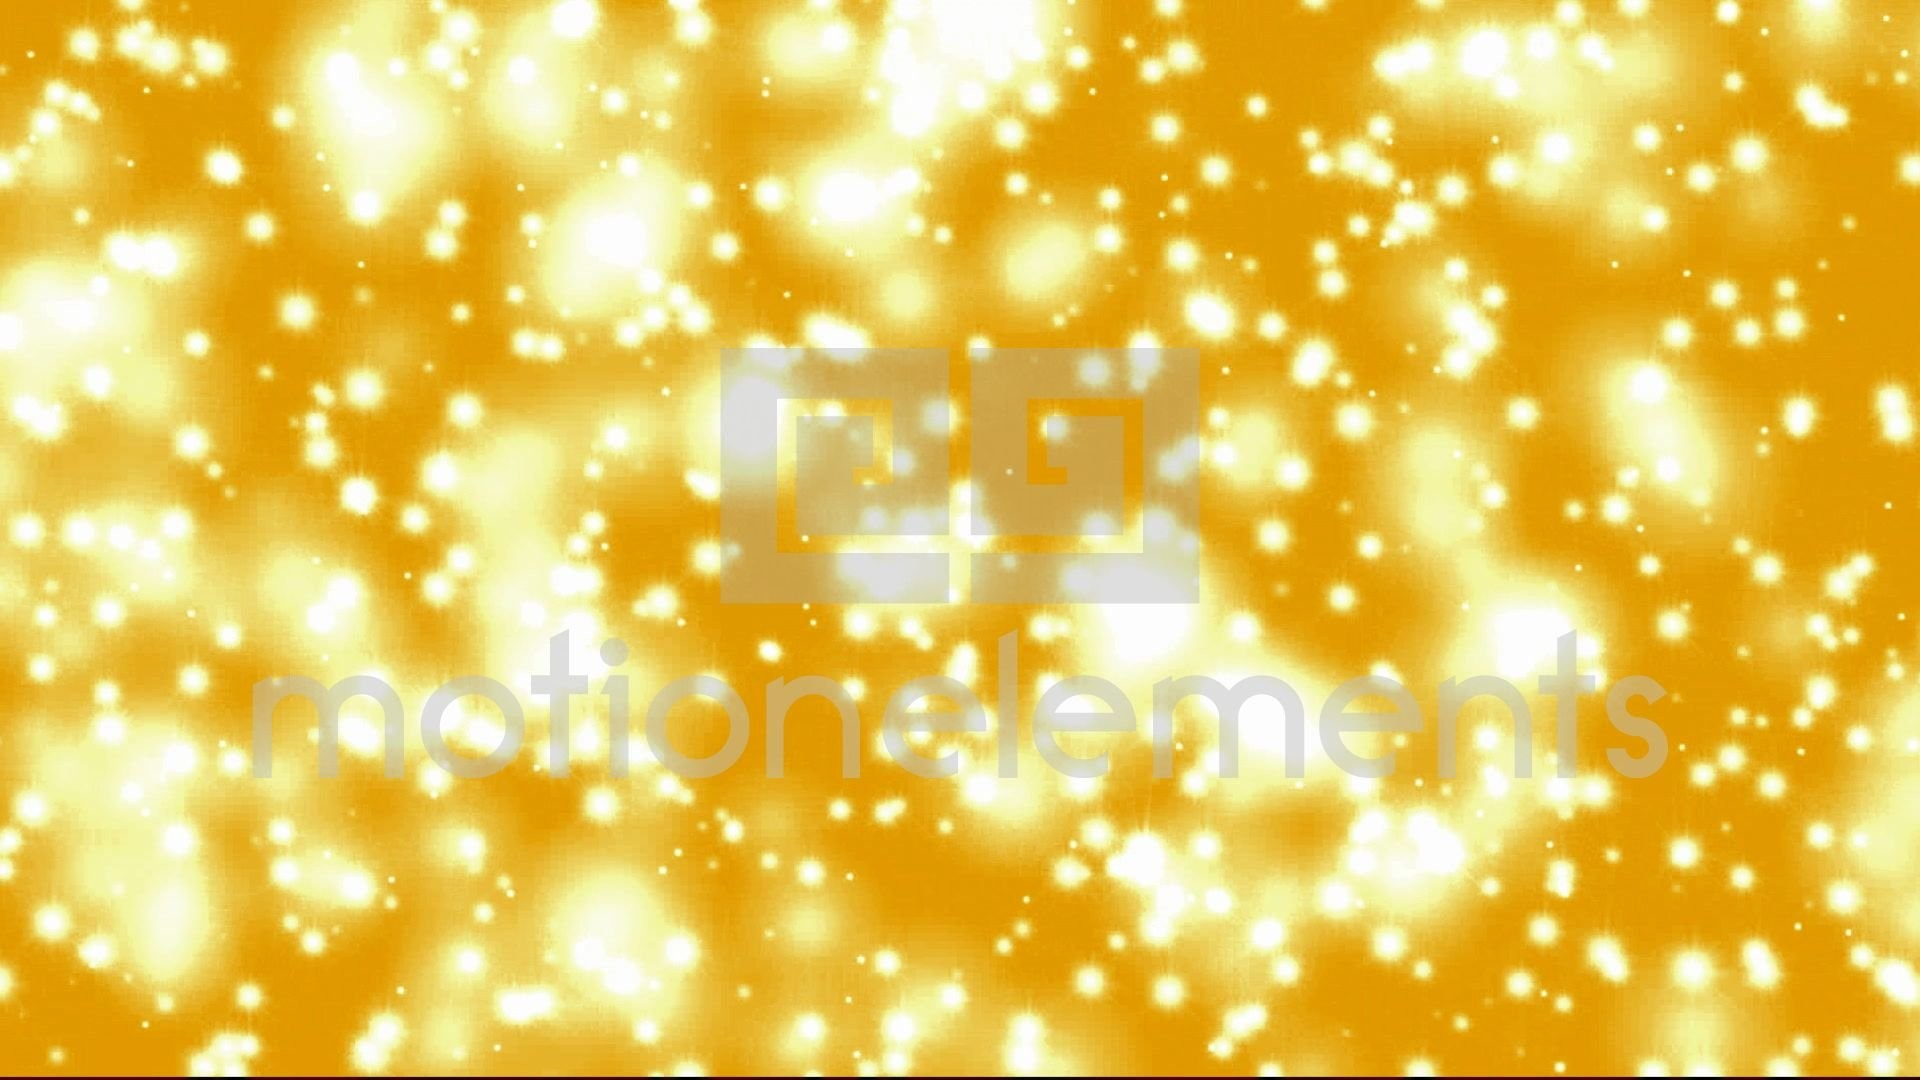 Res: 1920x1080, glitter gold highlights liquid gleaming dazzling animation stock golden  stars light media